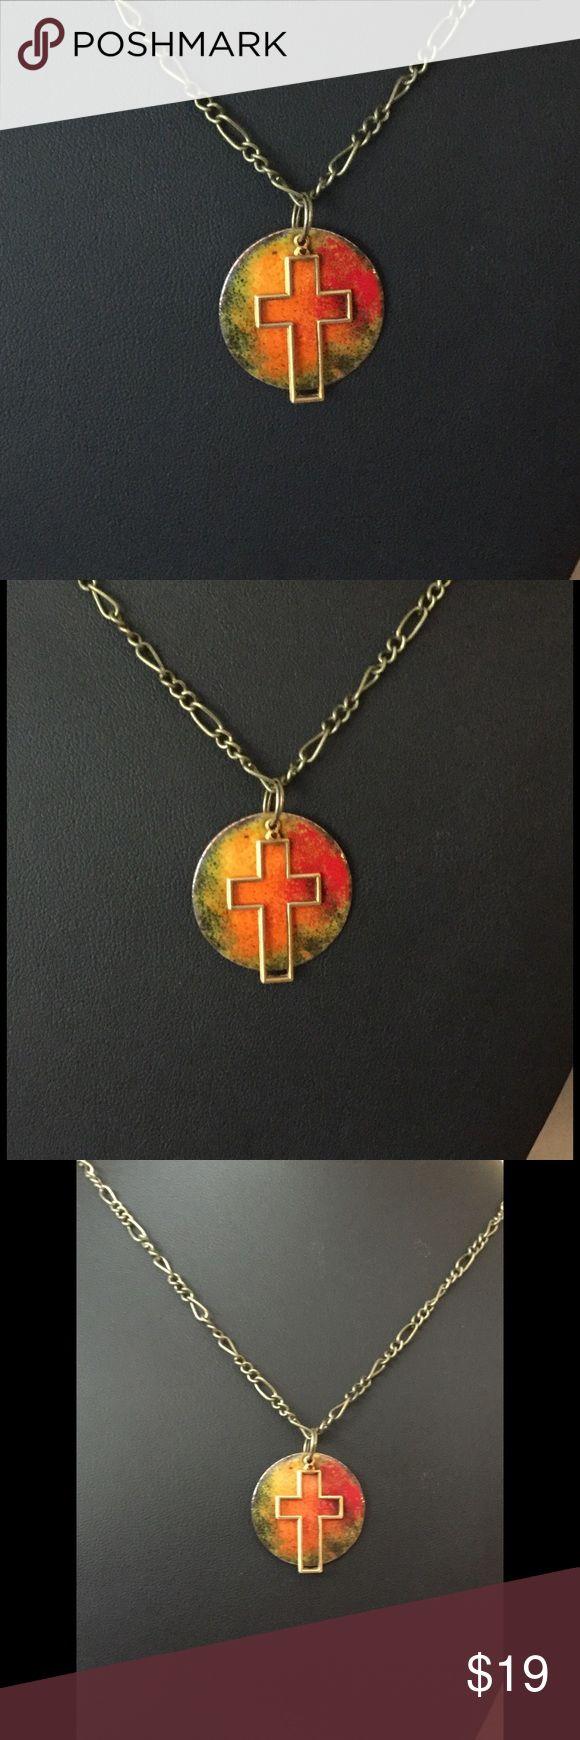 Shema israel bracelet israel bible jewish hebrew prayer kabbalah shma - Multi Colored Enameled Brass Cross Necklace A 3 19 1 Copper Disk That